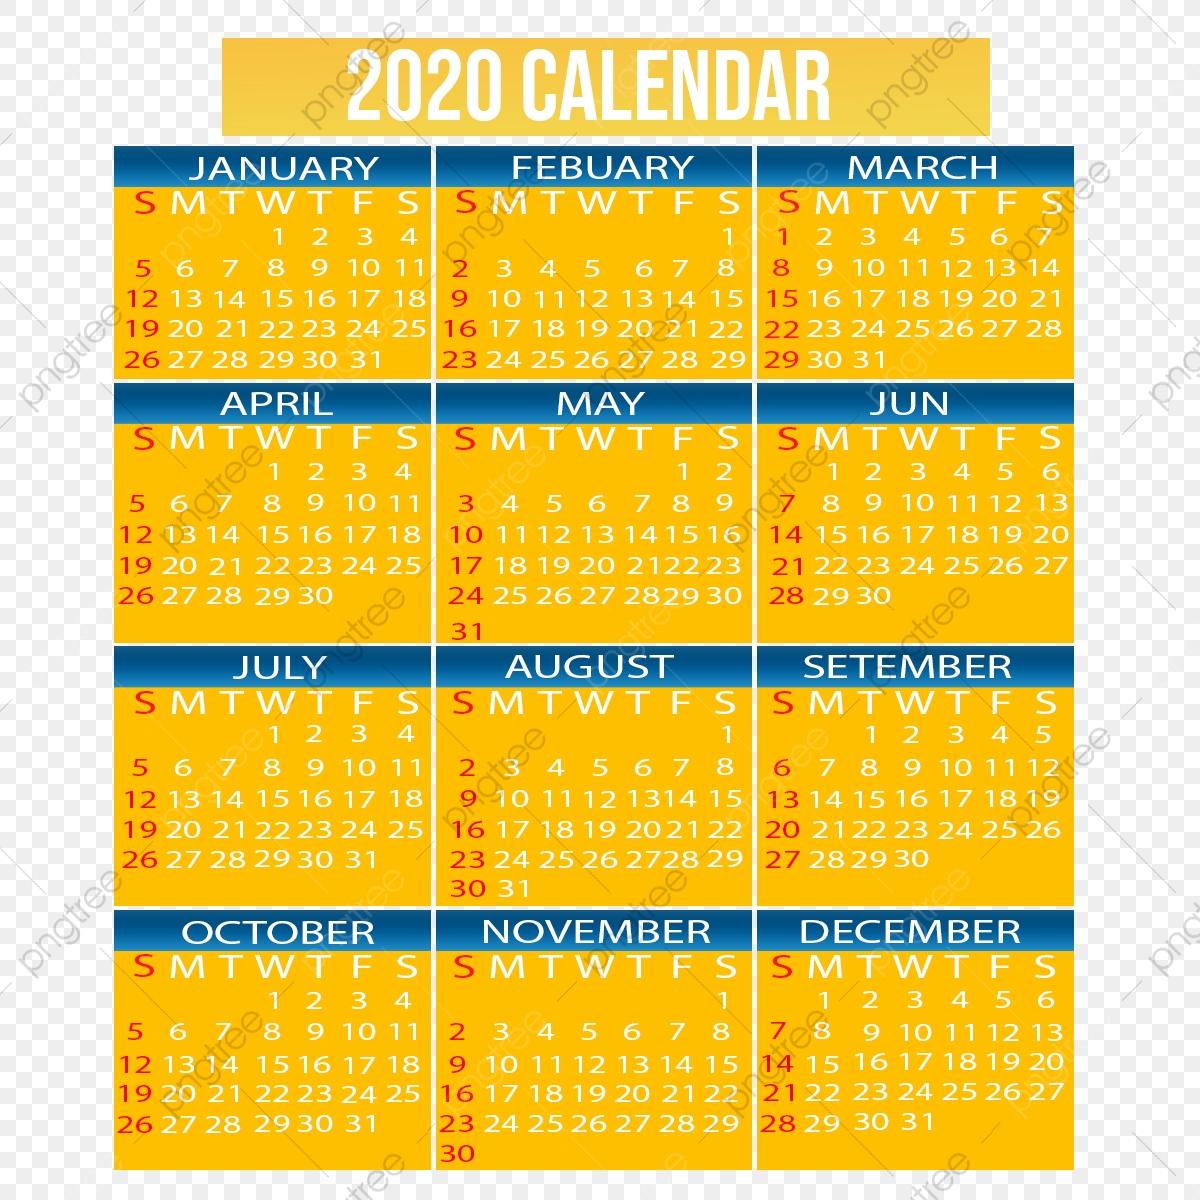 2020 Calendar, 2020, Calendar Png Transparent Clipart Image regarding 2020 Calendar Psd File